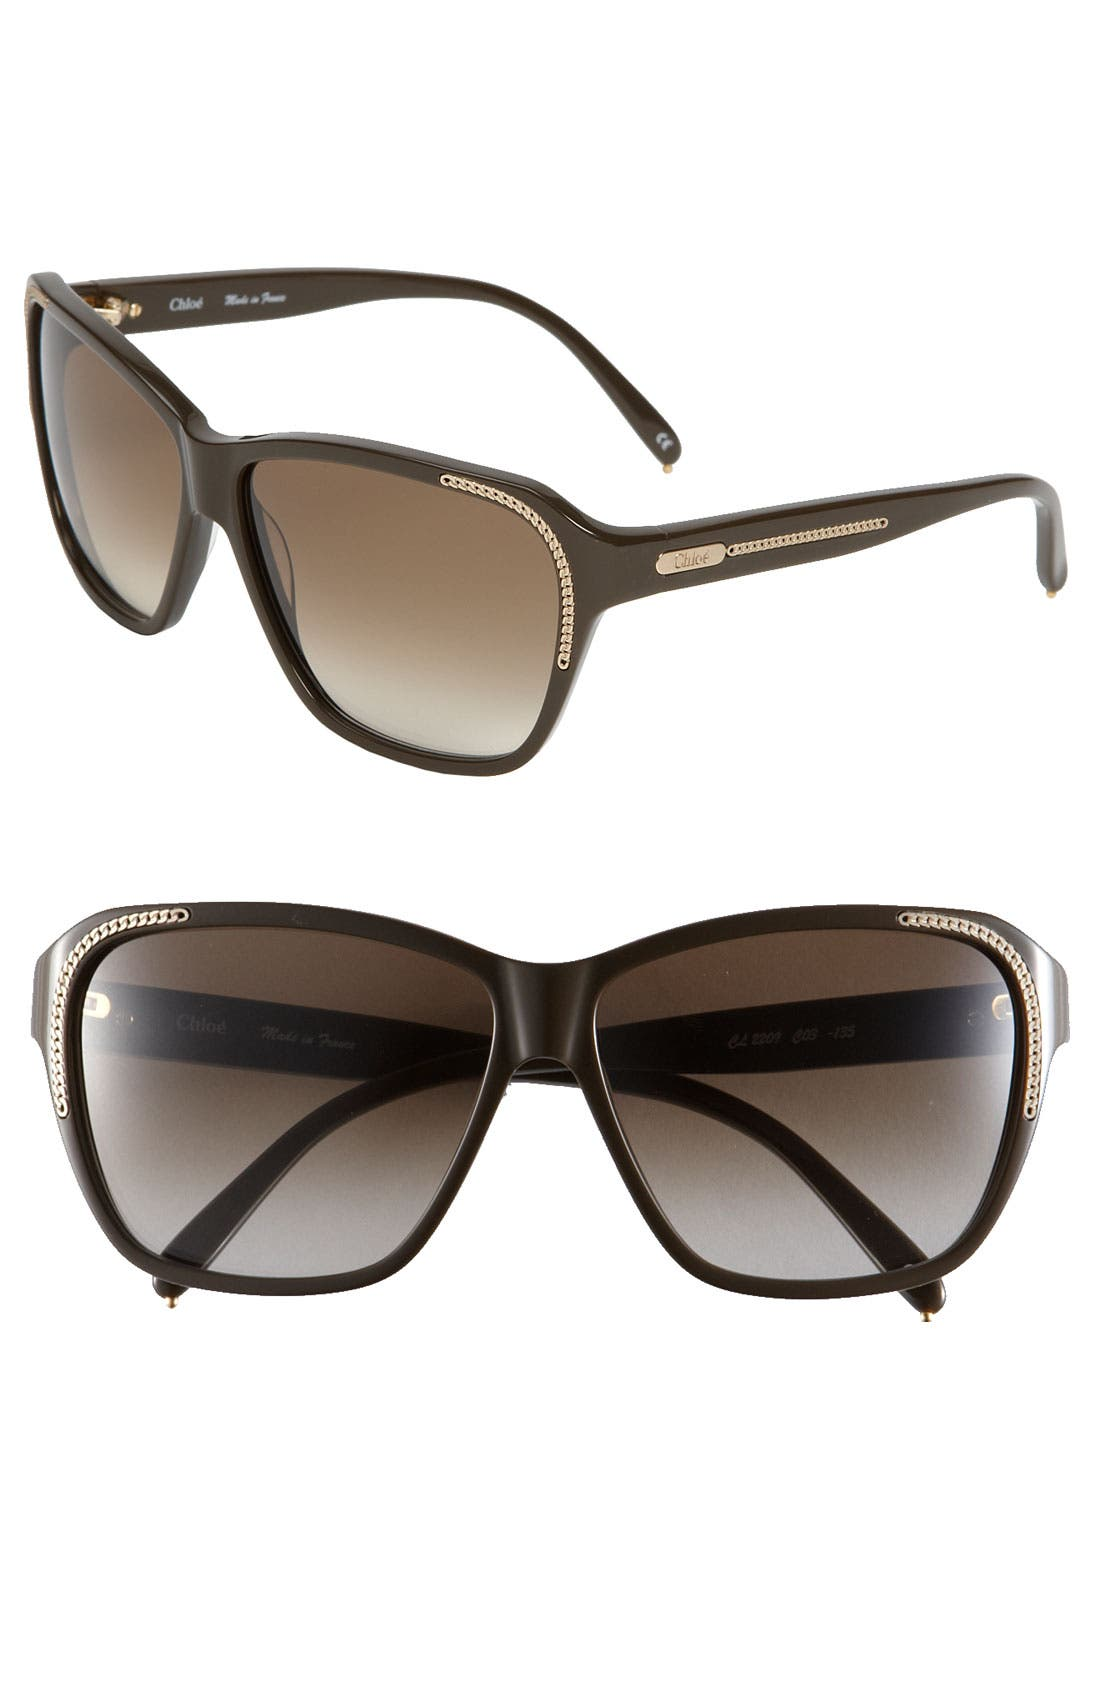 Alternate Image 1 Selected - Chloé '2209' Sunglasses